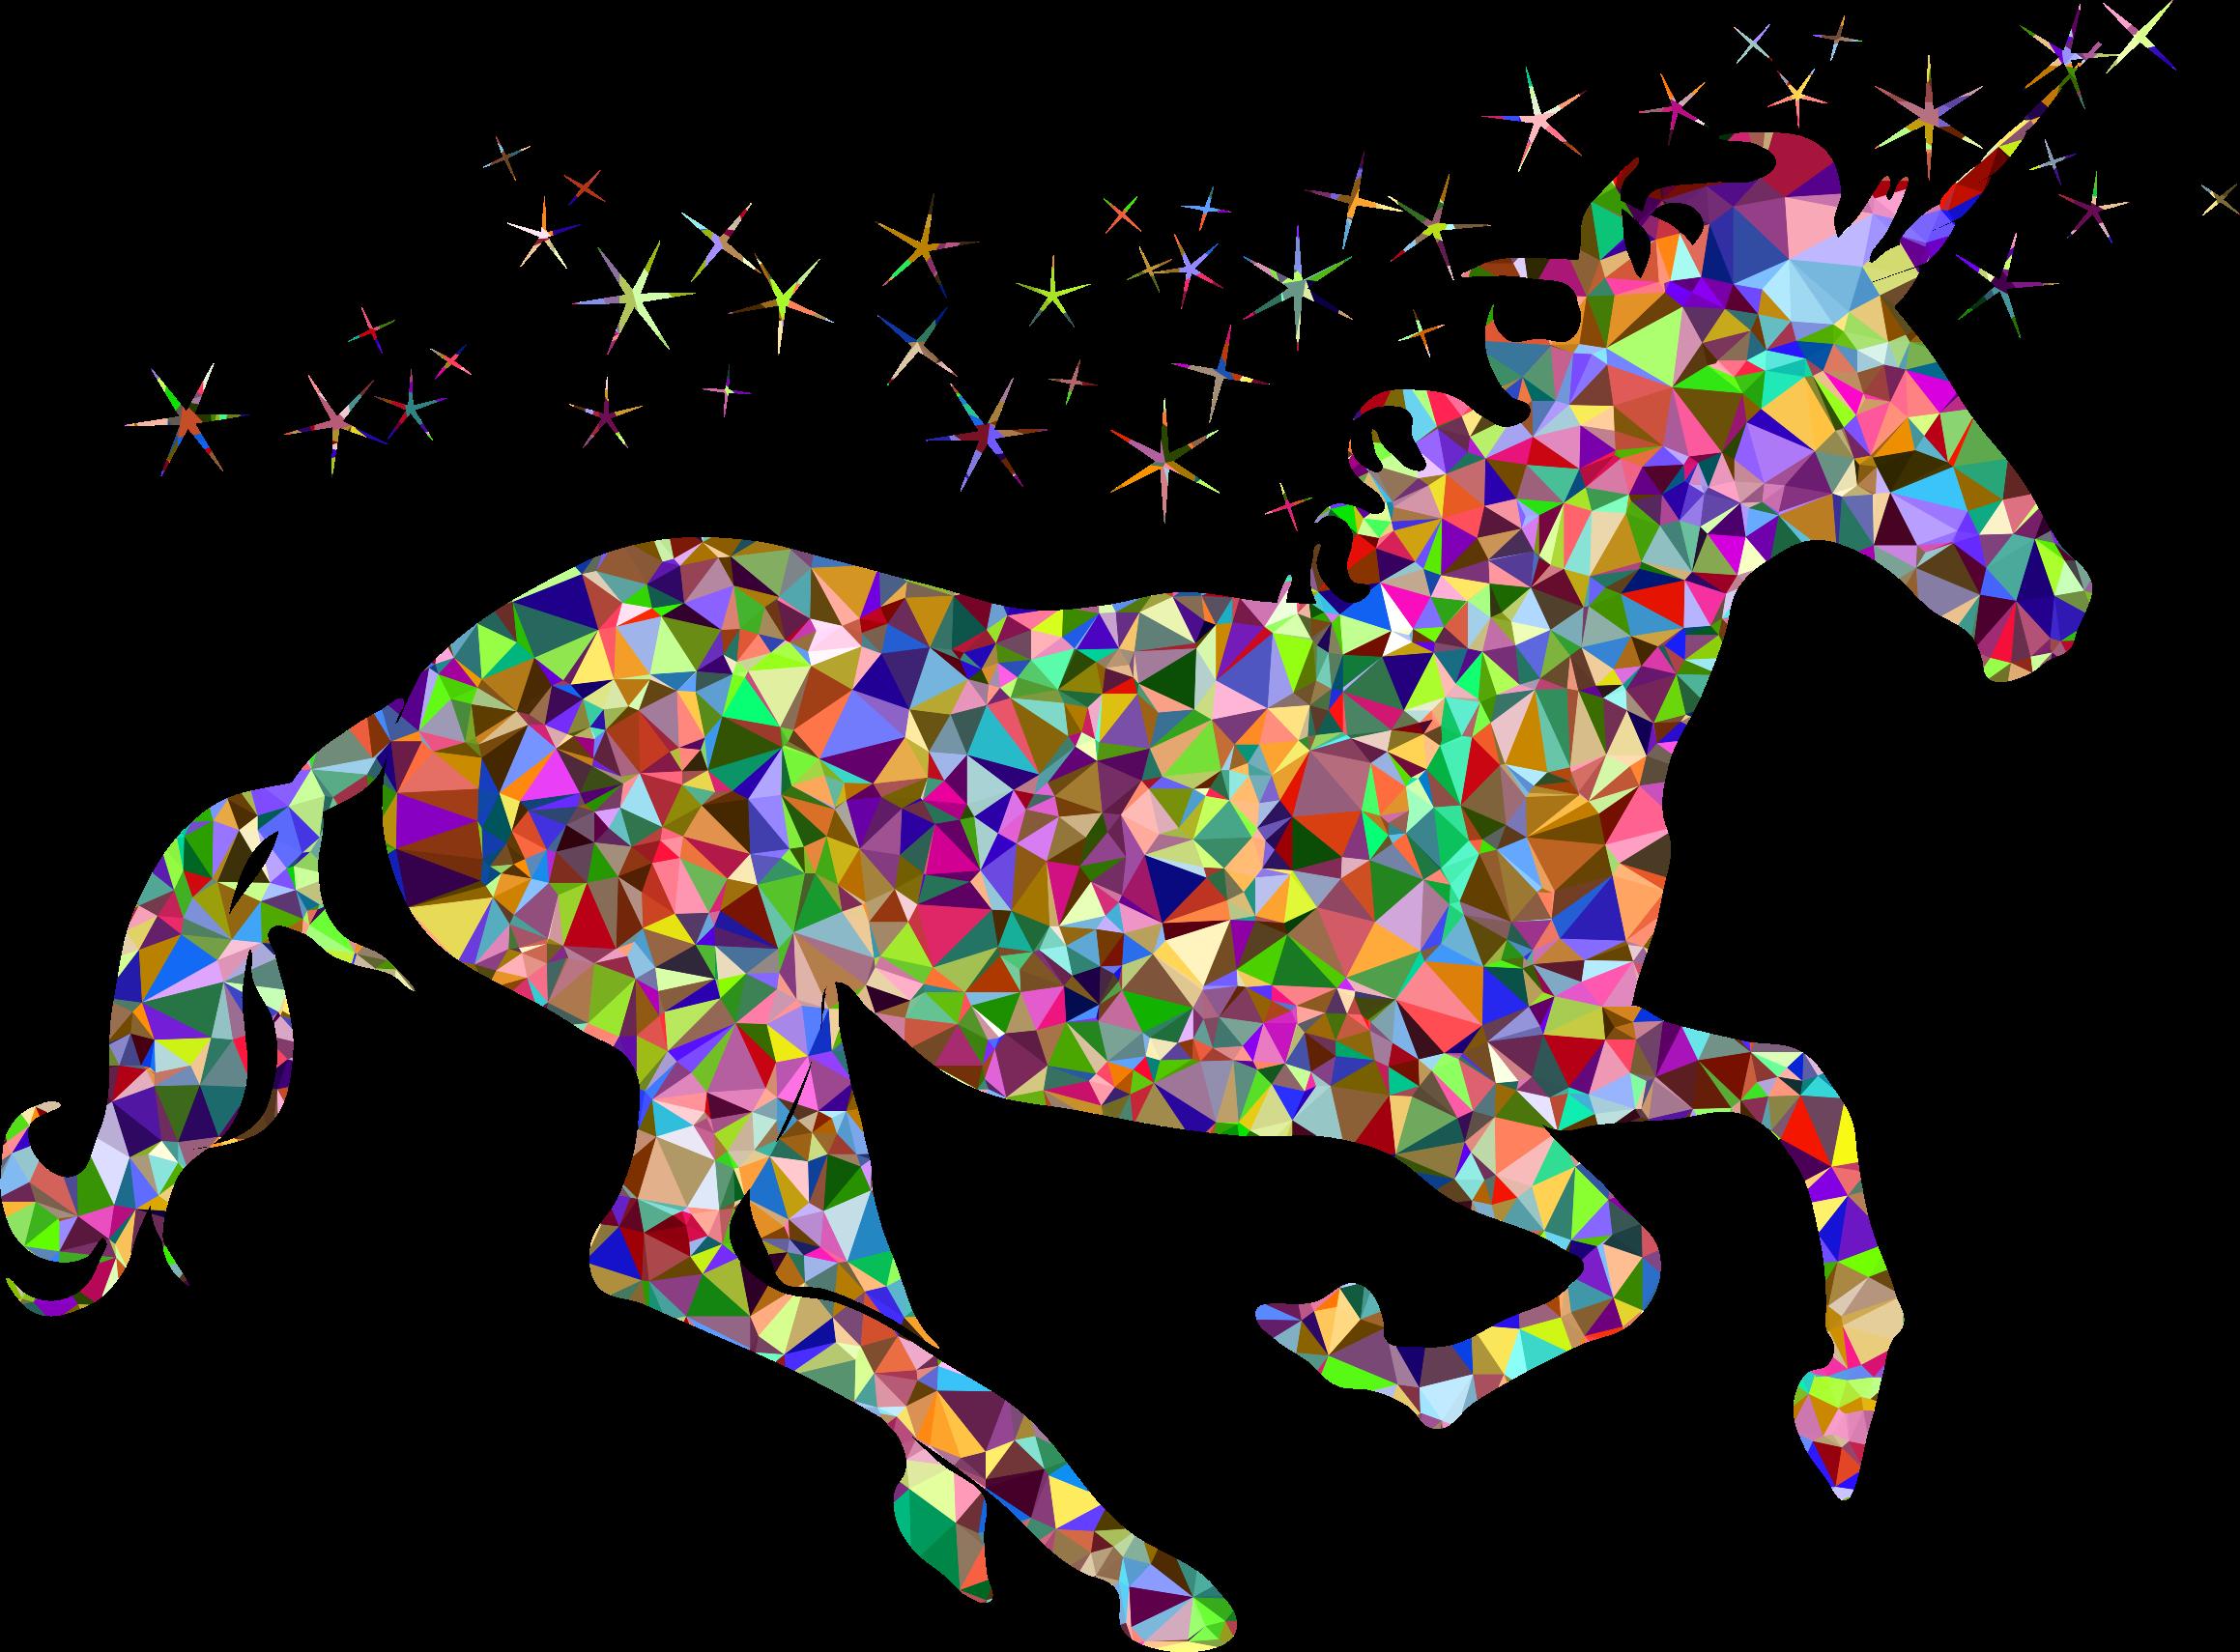 Big clipart unicorn. Chromatic gem magical image